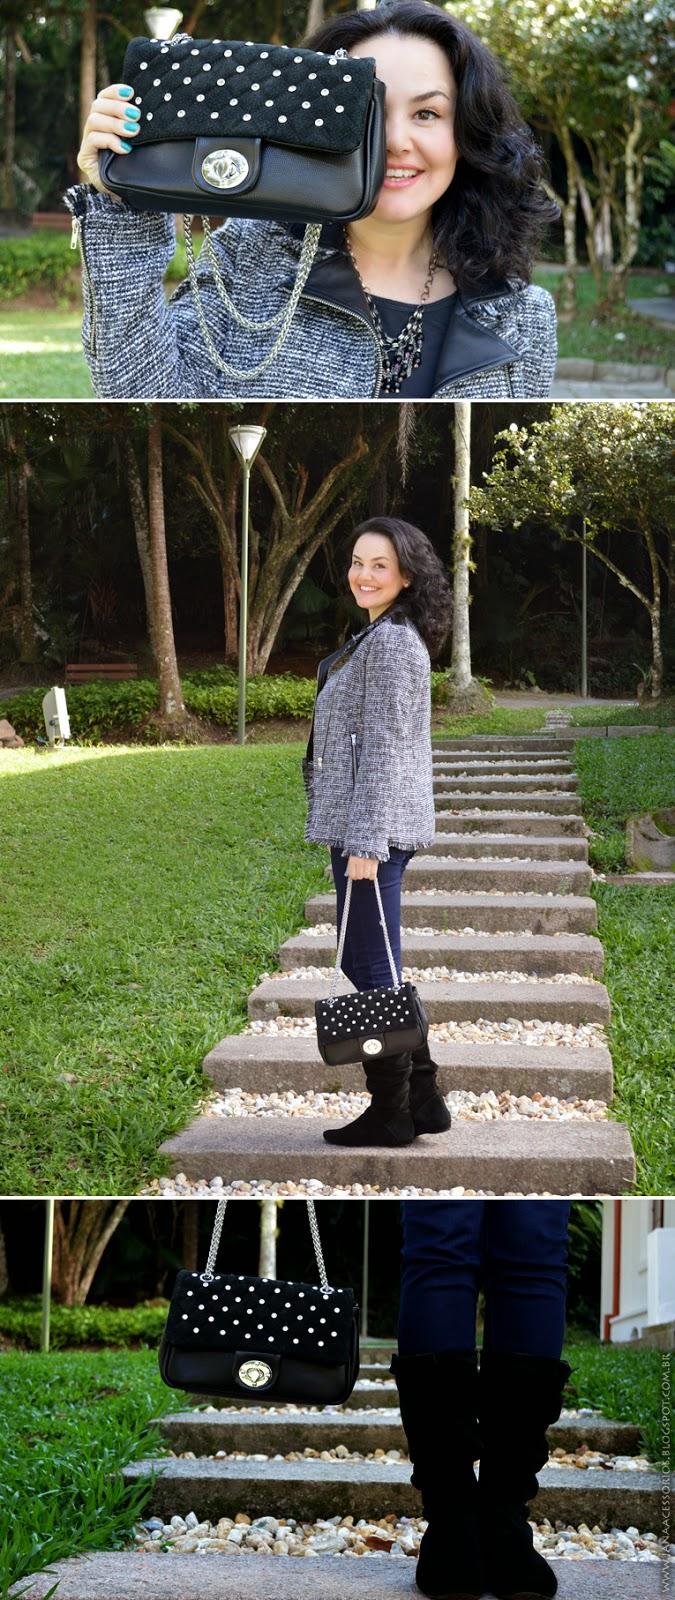 Blog de acessórios, Blogueira, blogger, joinville, renner, Arezzo, Jana Acessórios, Acessórios, Look da Jana - Mix de textura e materiais.